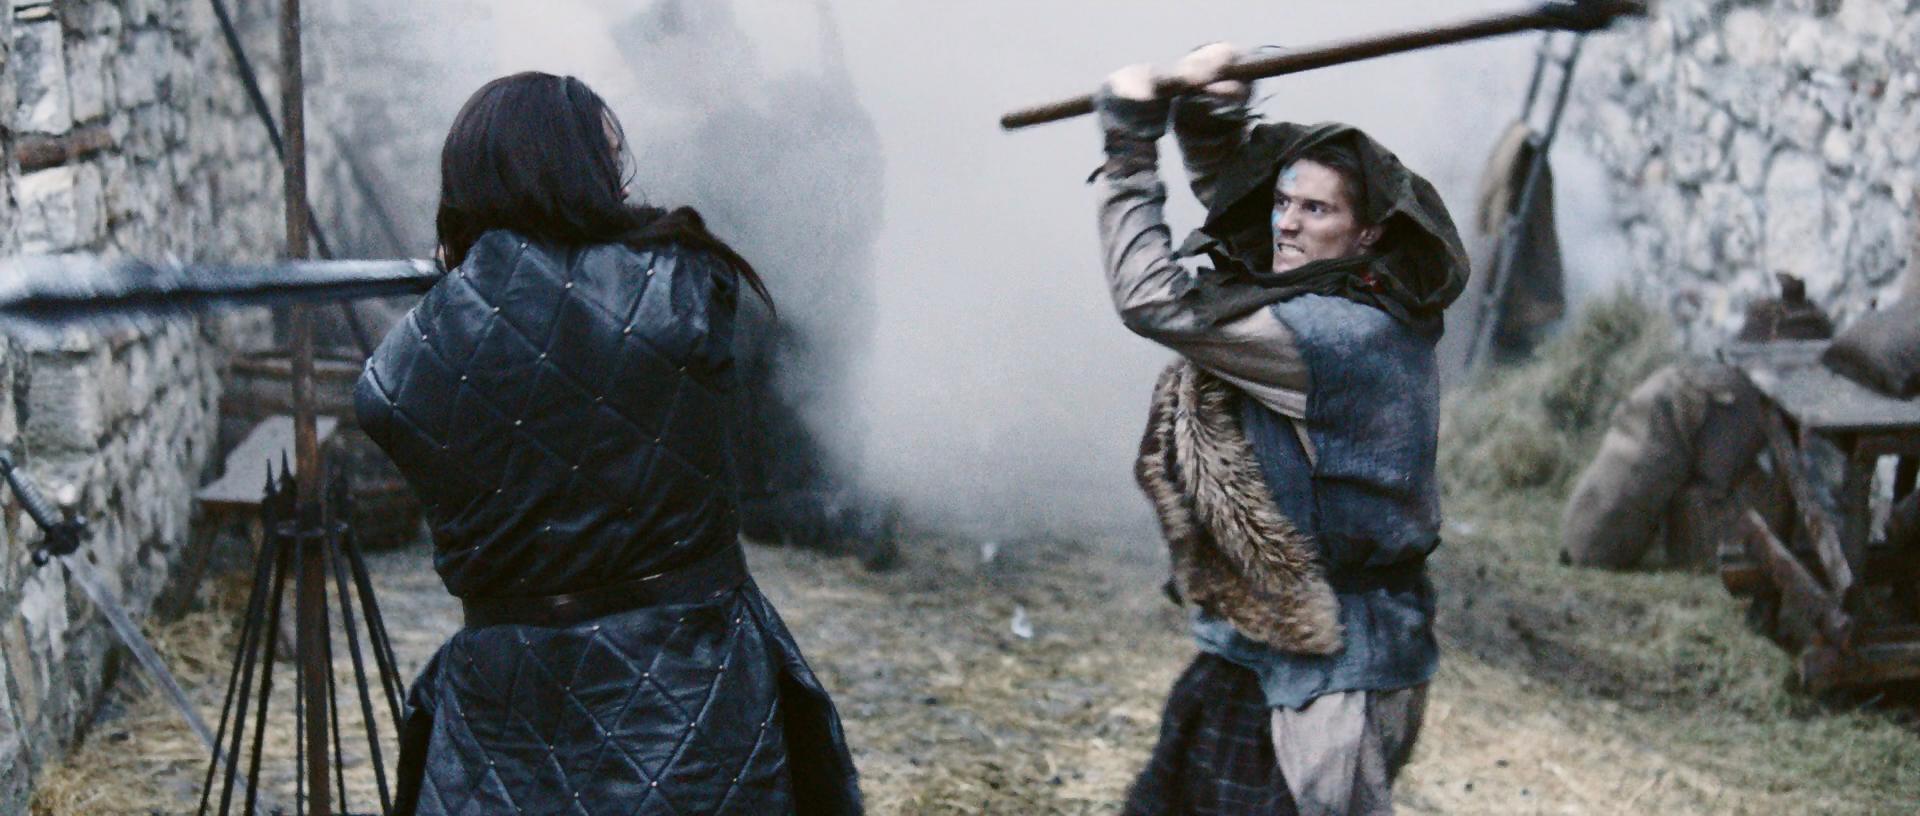 Железный рыцарь 2 / Ironclad: Battle for Blood (2014/BDRip) 1080p, D